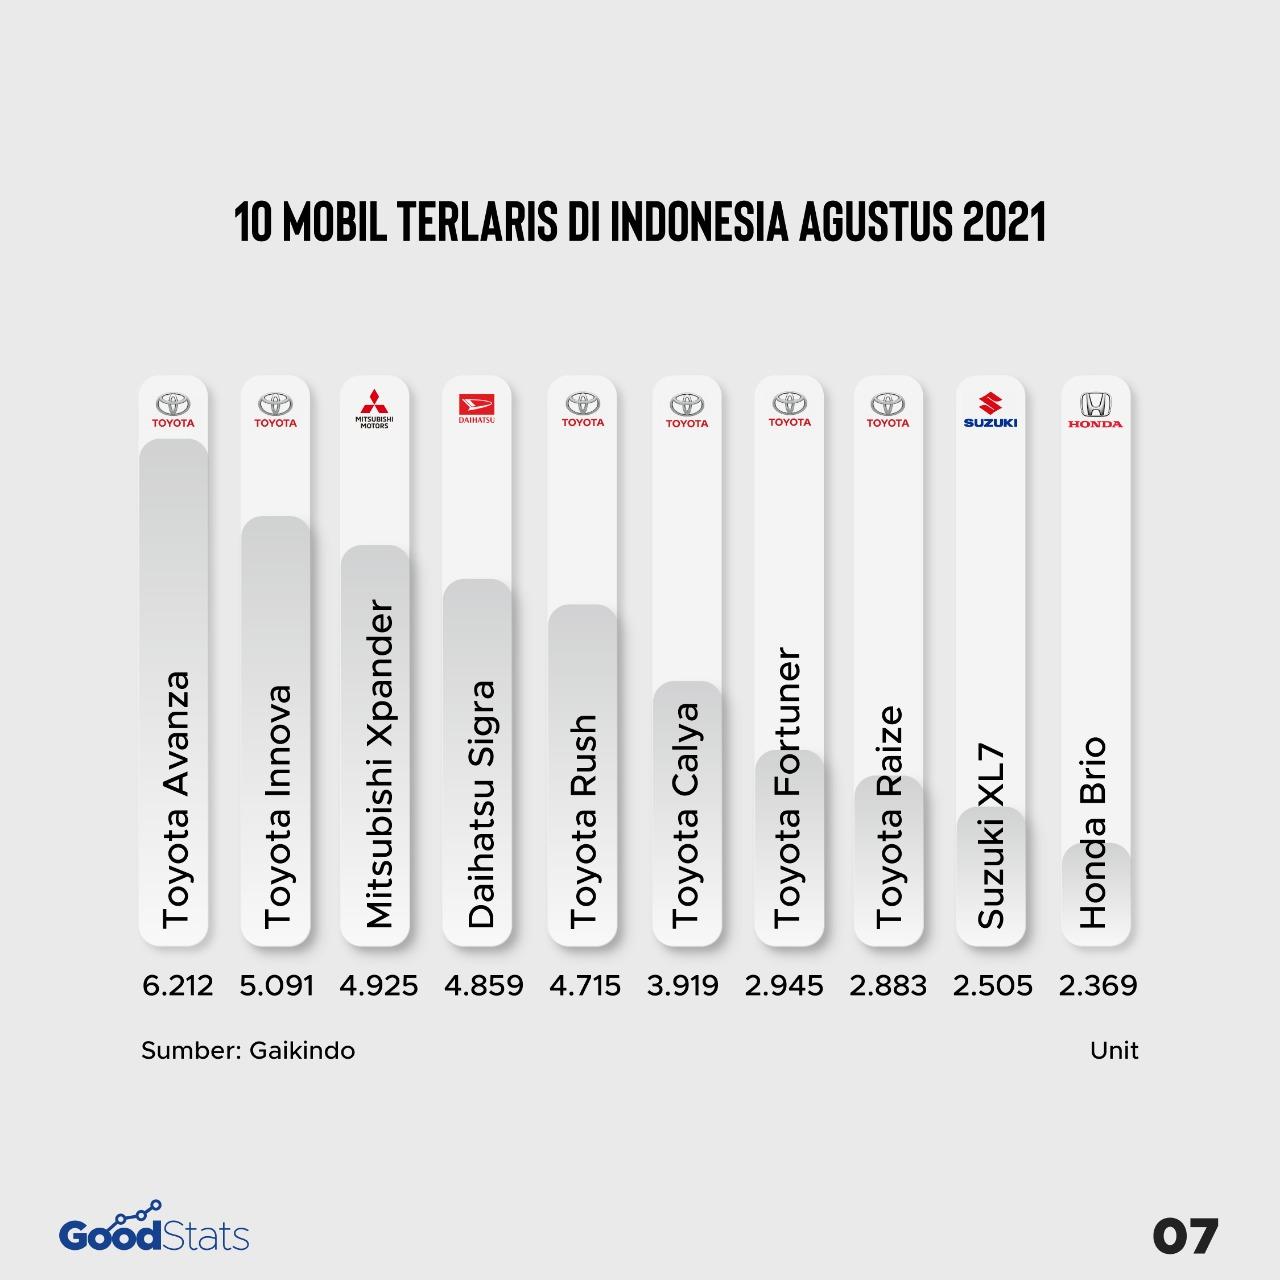 10 Mobil terlaris di Indonesia wholesales Agustus 2021 | GoodStats